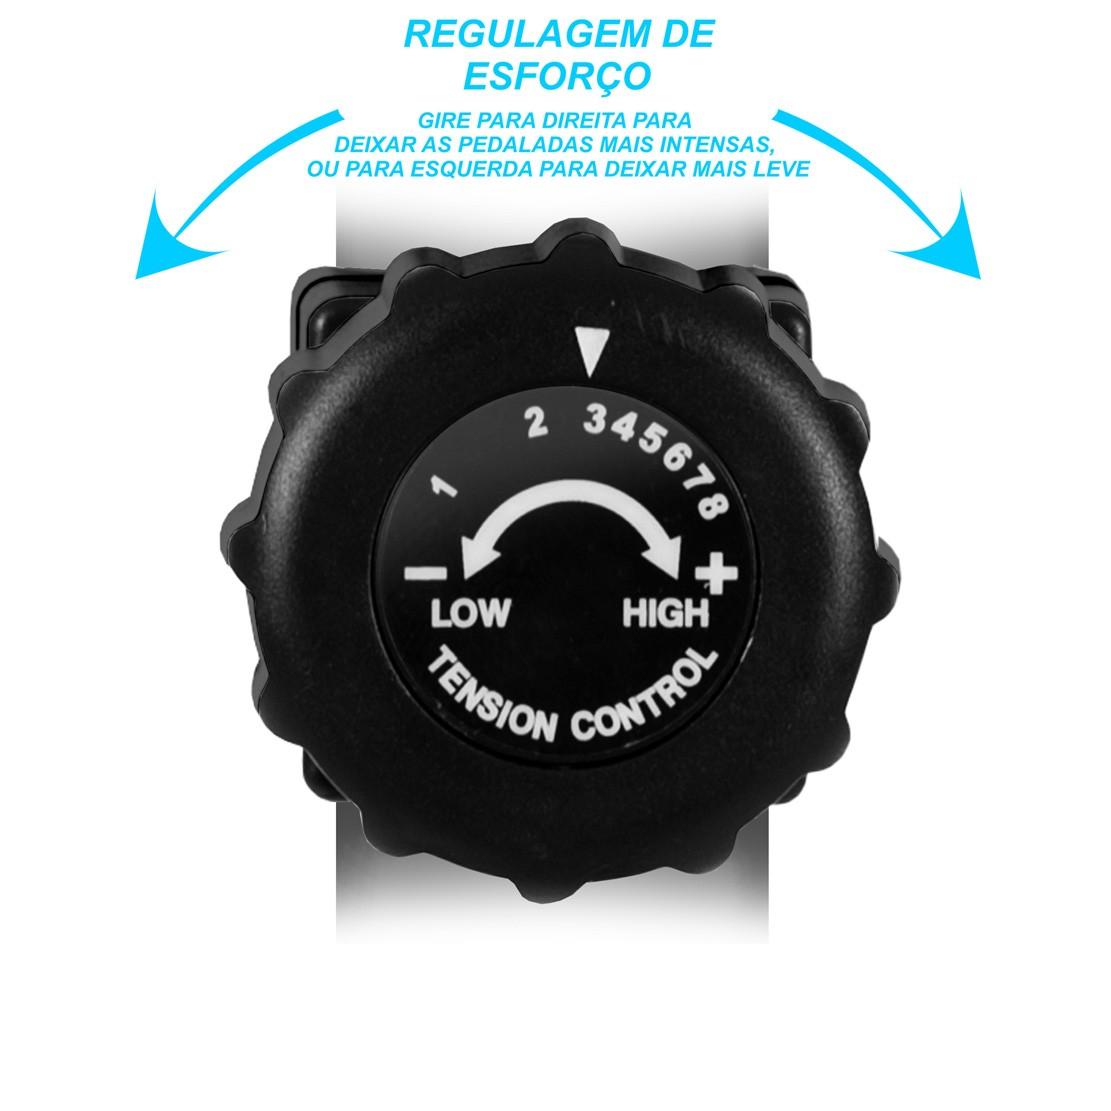 Bicicleta Ergométrica Horizontal PodiumFit H100 - Magnética - 8cargas